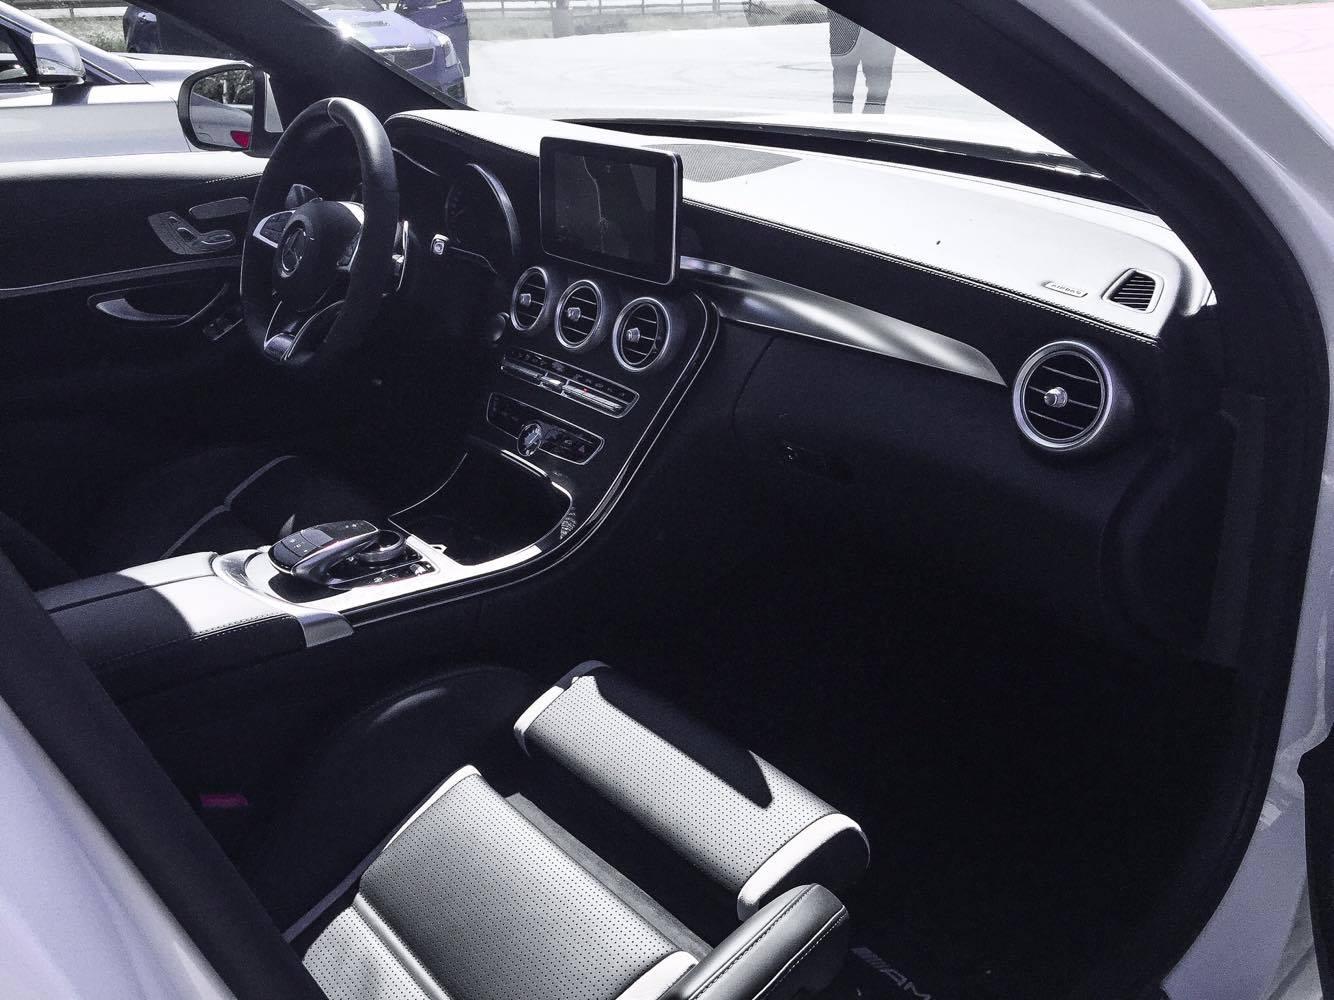 Mercedes-Benz C63 S AMG Interior